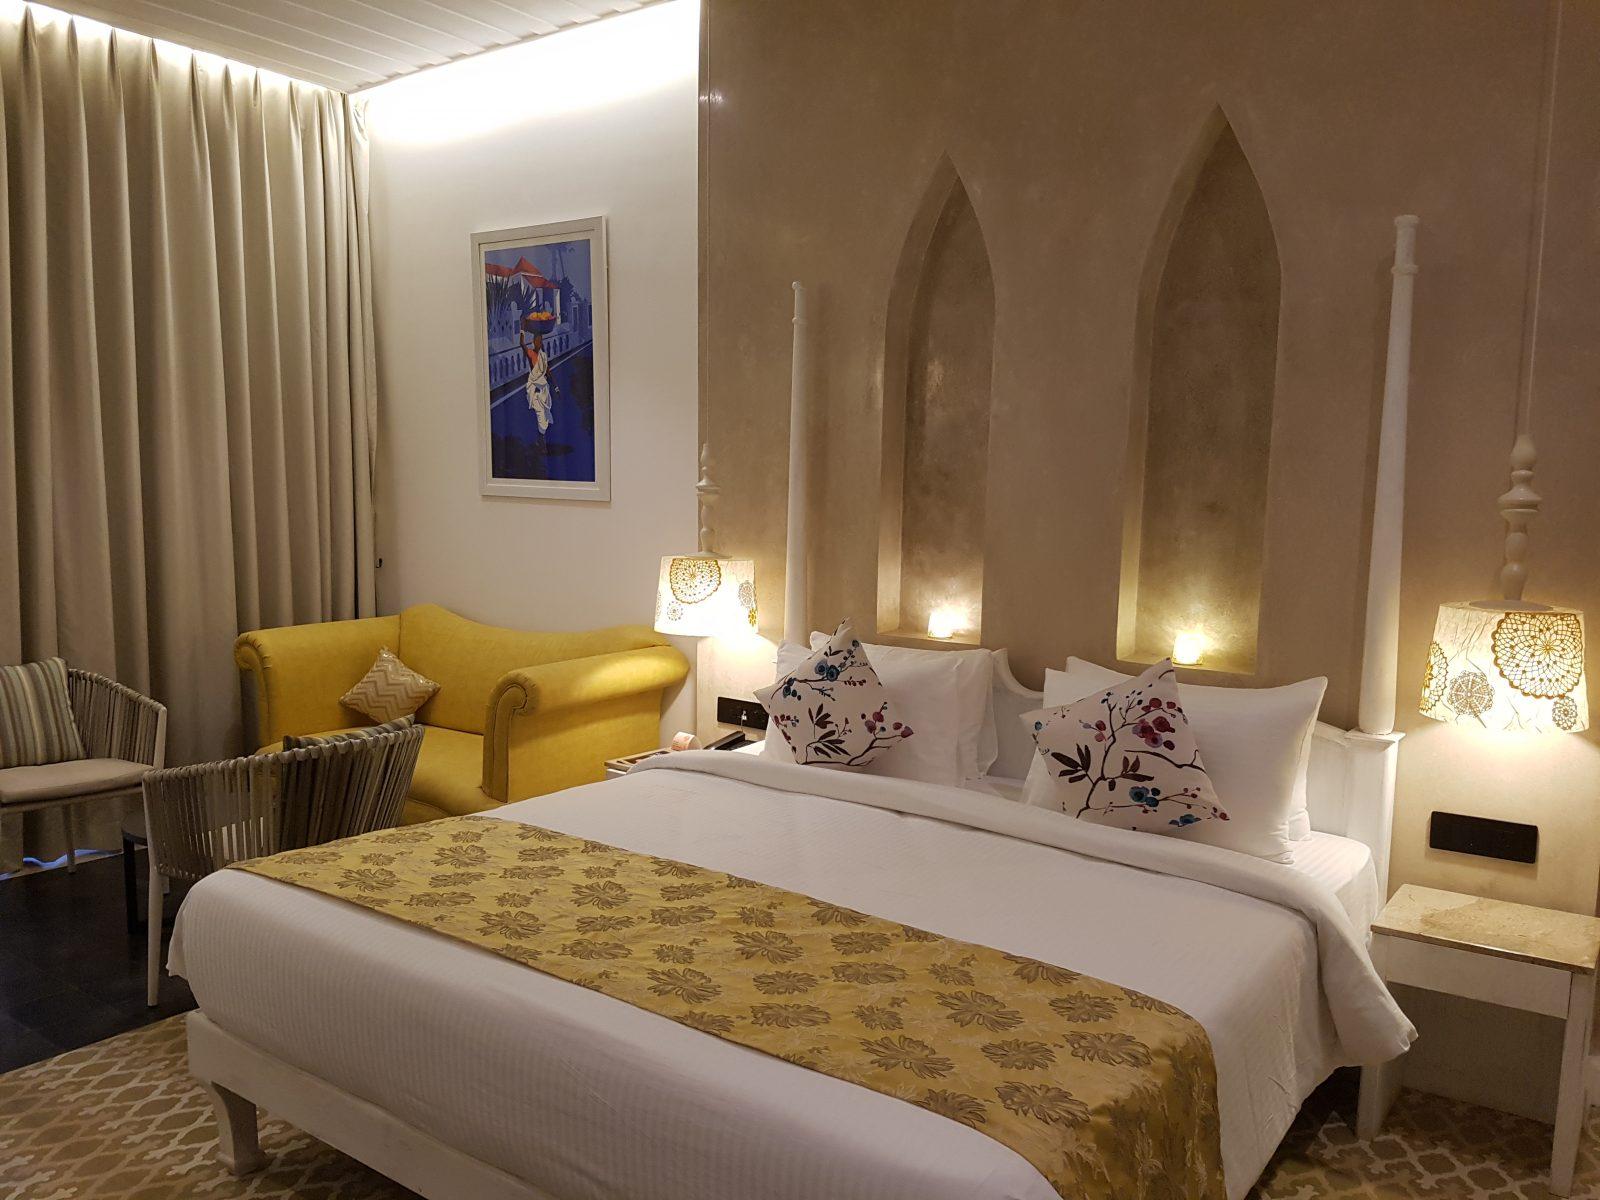 Maravilha – Boutique Hotel in Goa